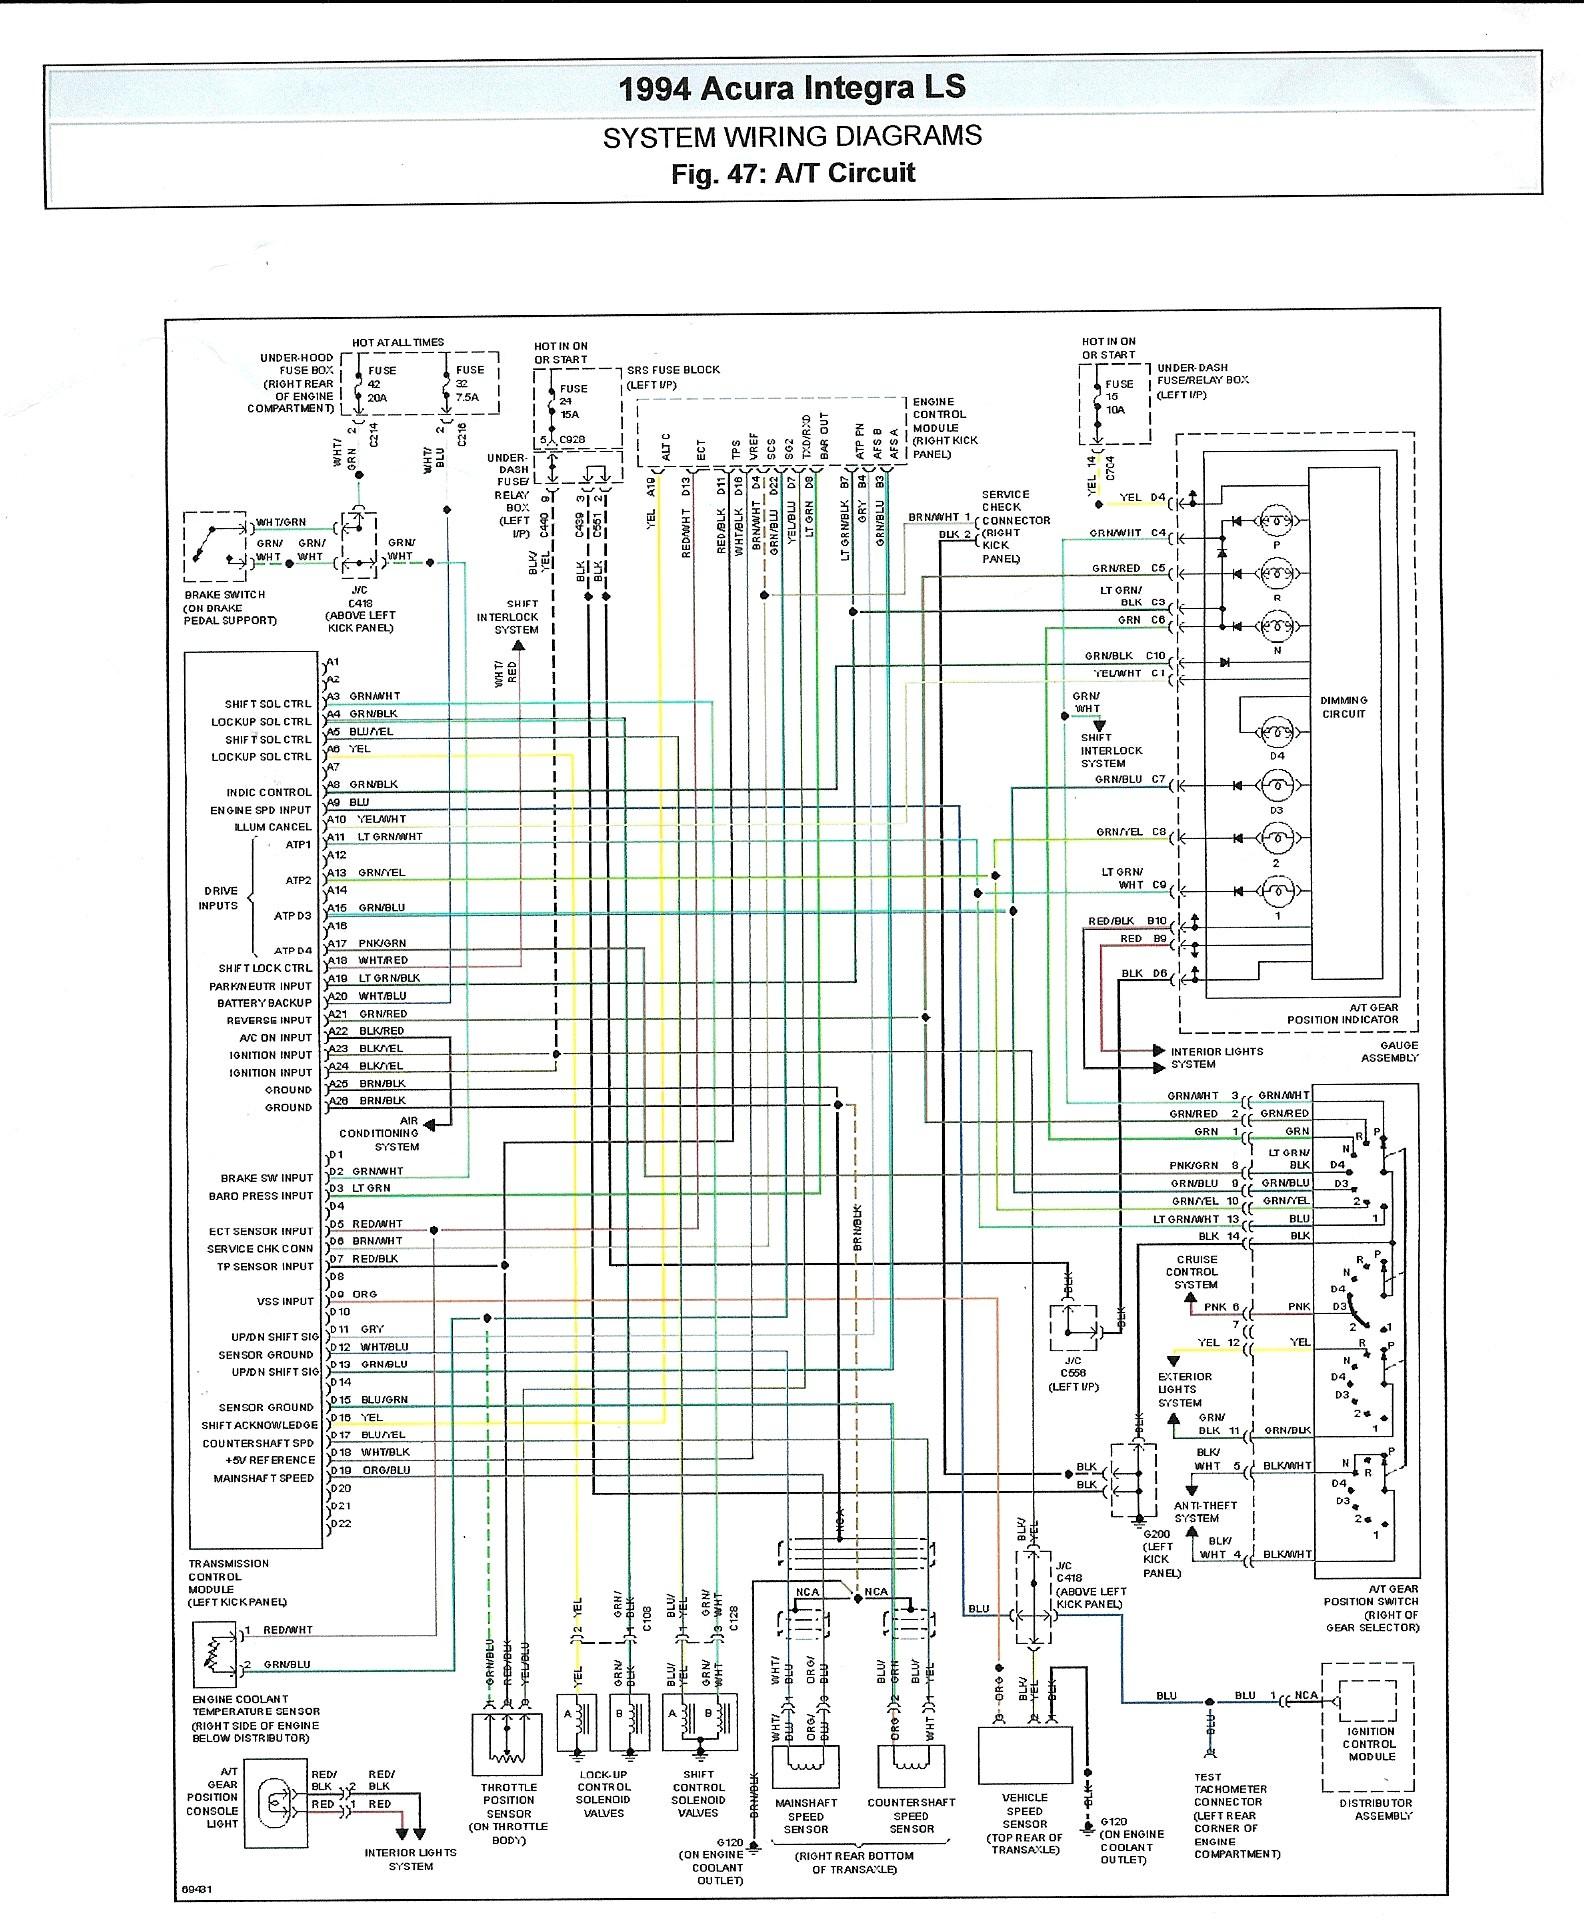 95 Civic Engine Diagram Jeep Wrangler Air Conditioning 1995 Honda Conditioner Schematic Wiring Diagrams Dejual Of